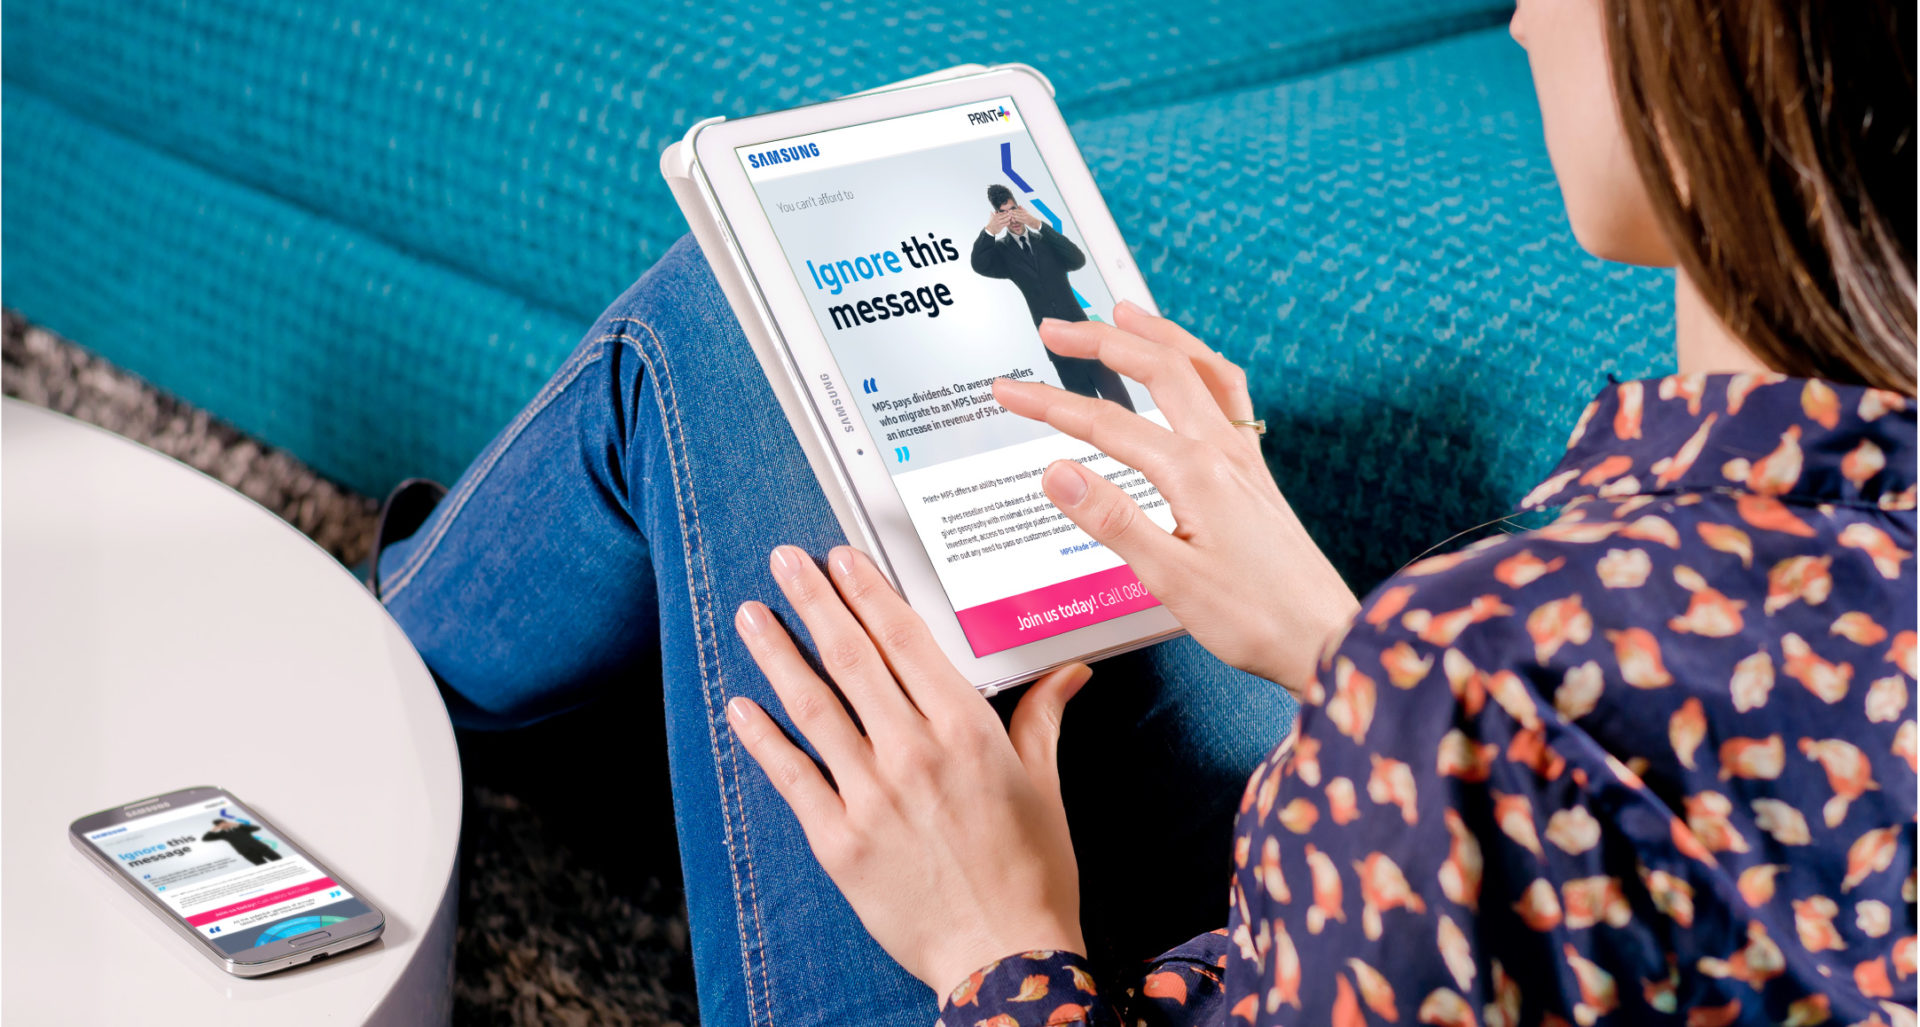 Samsung-Europe-digital-marketing-email-tablet